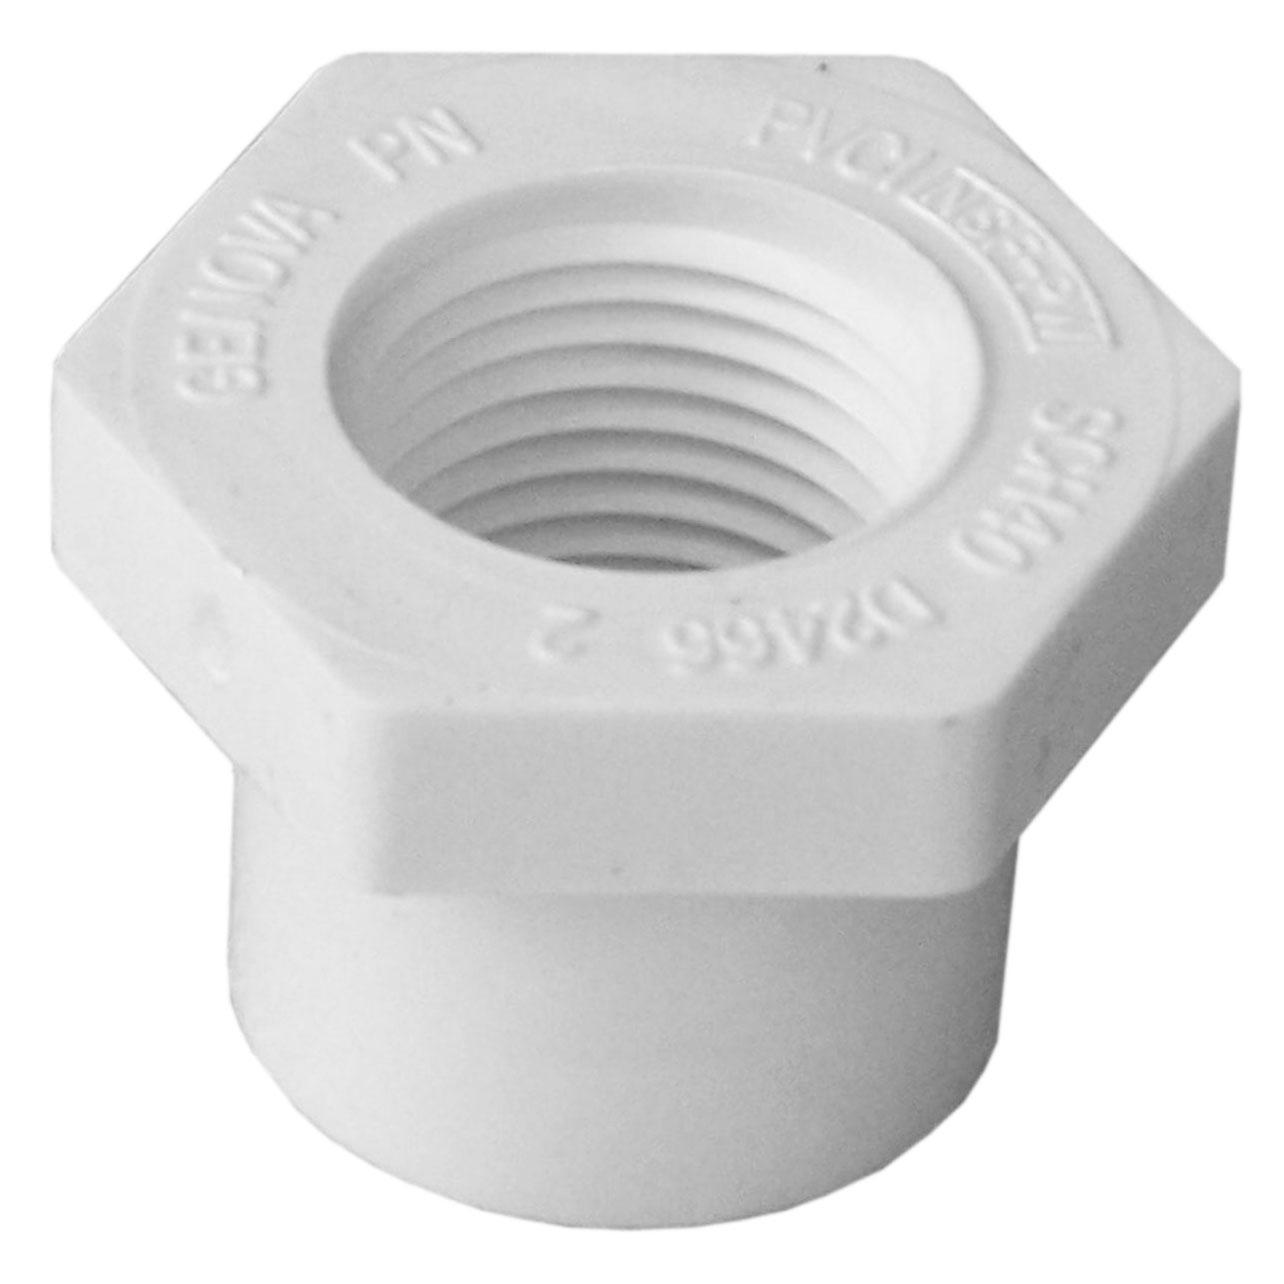 PVC Reducing Bushing (SPIGOT x FIP)